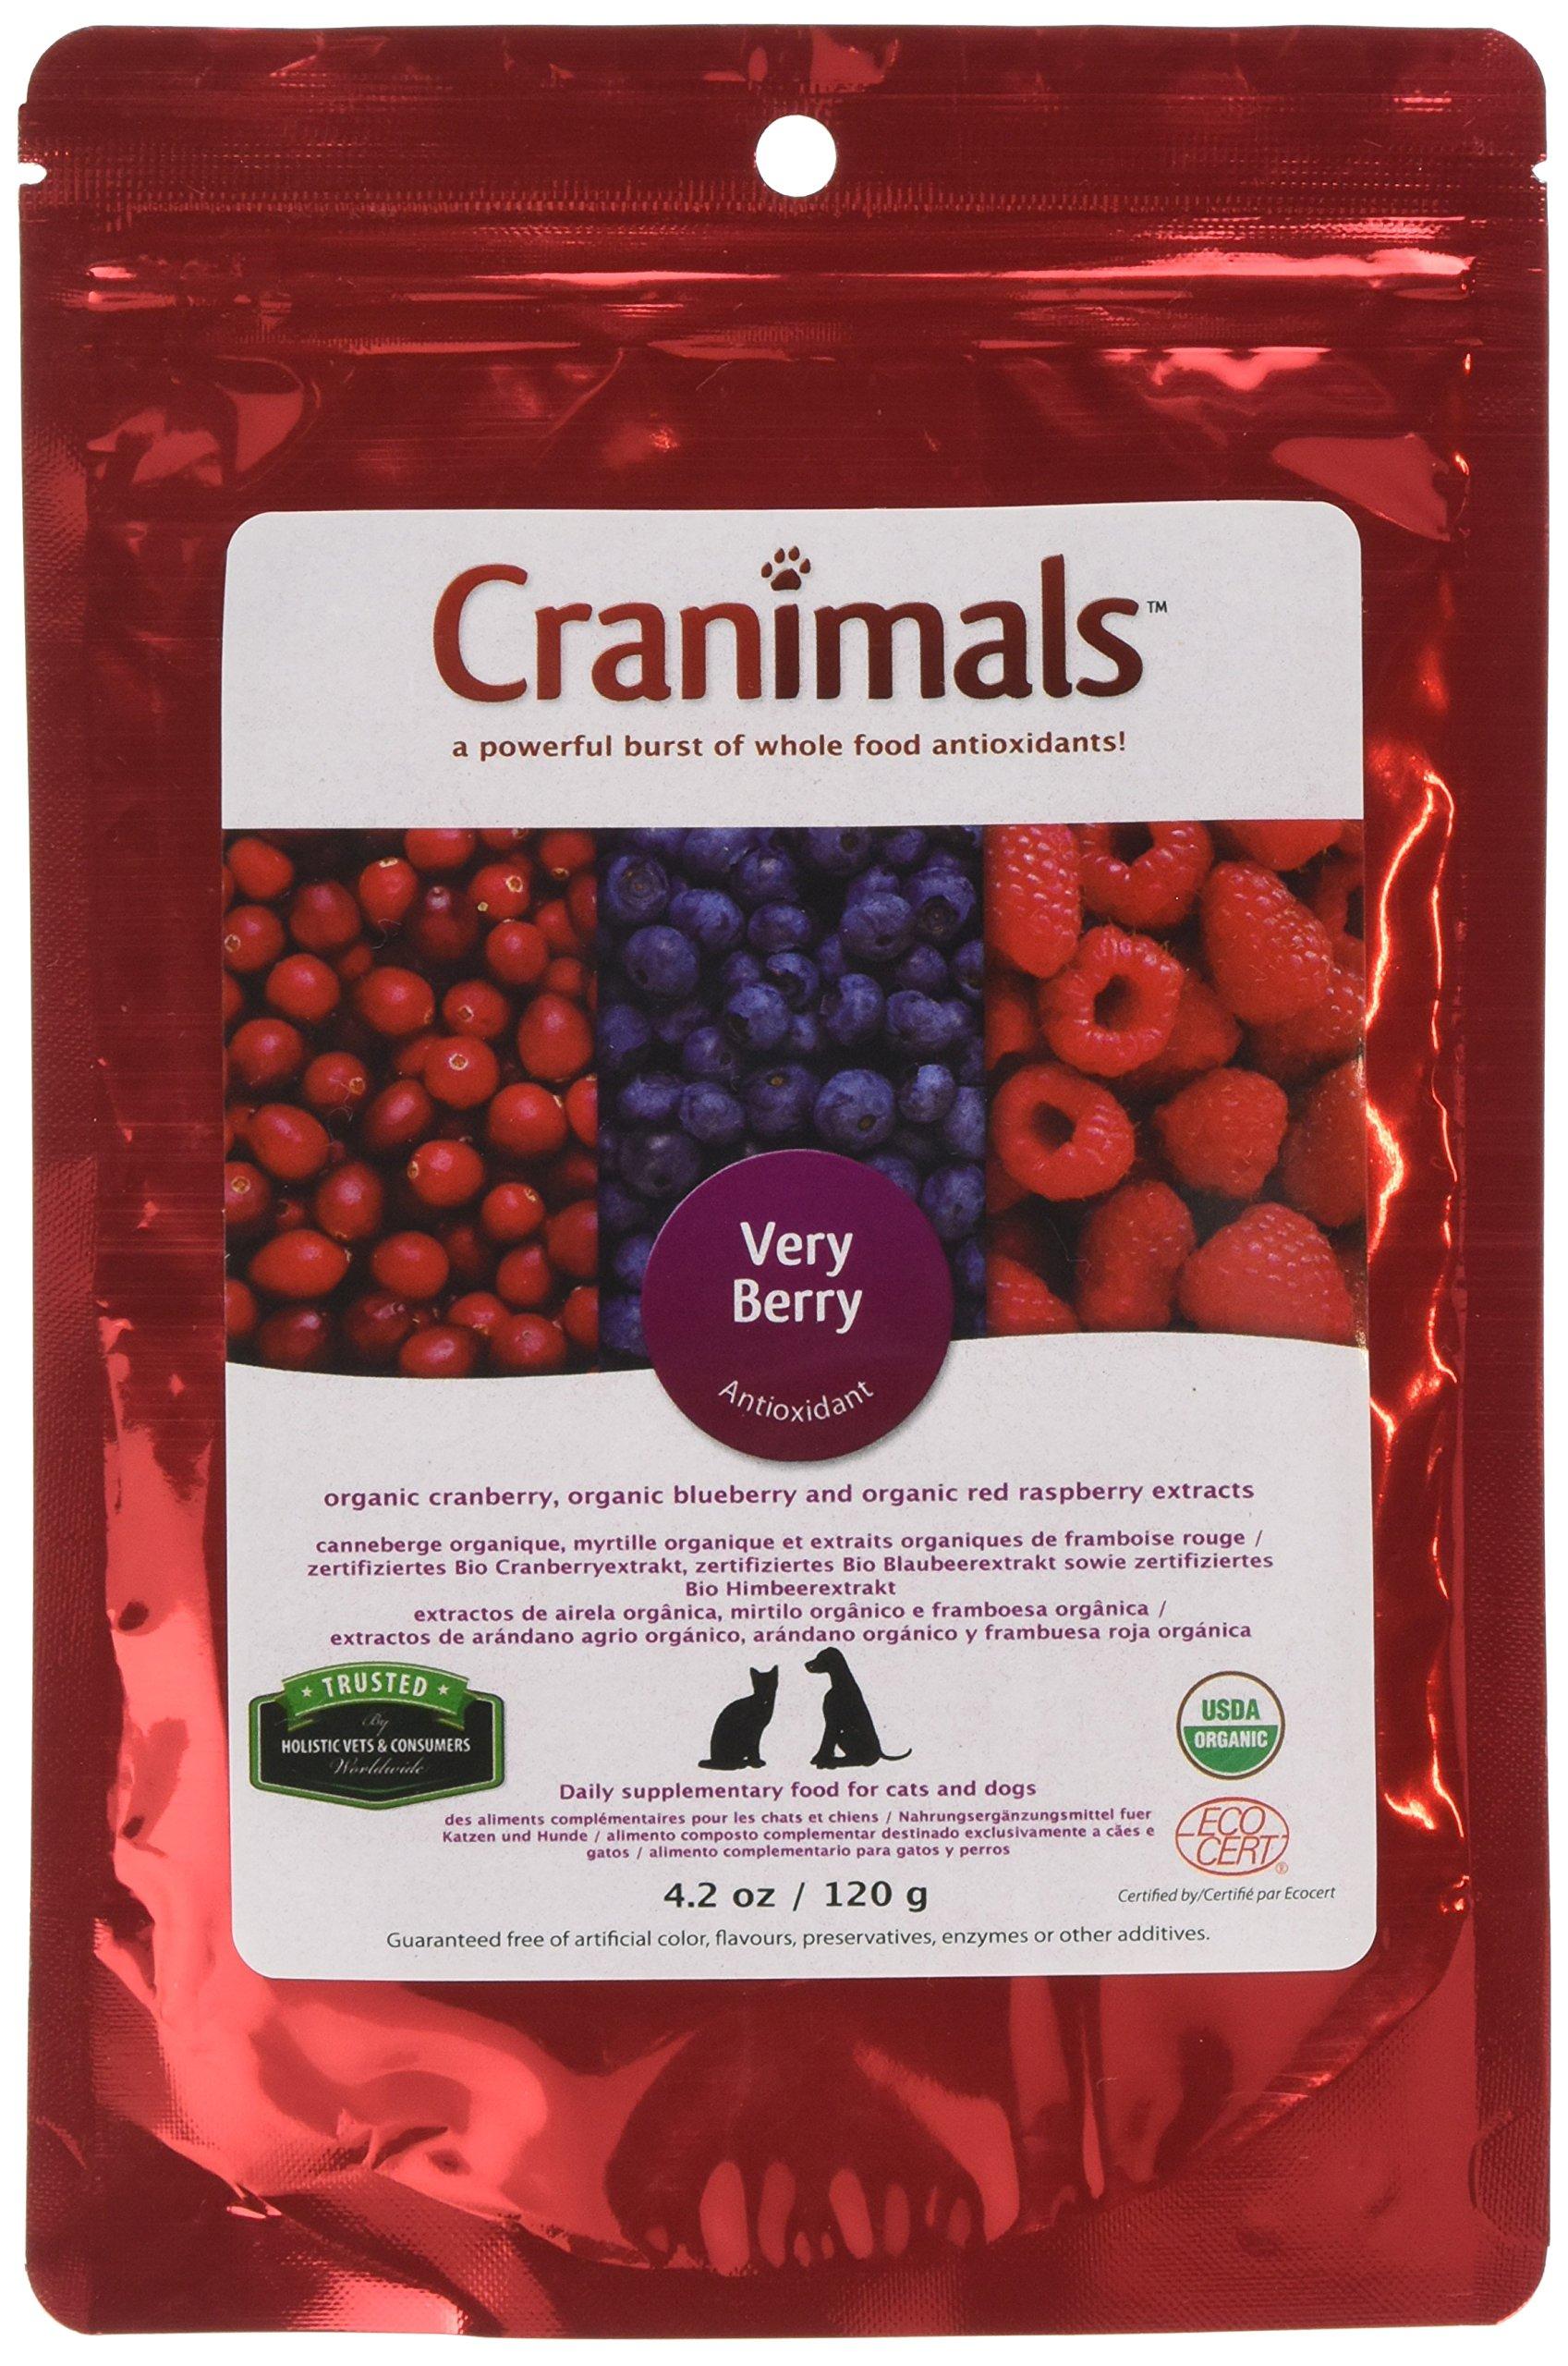 Cranimals Very Berry Supplement 120g/4.2 oz